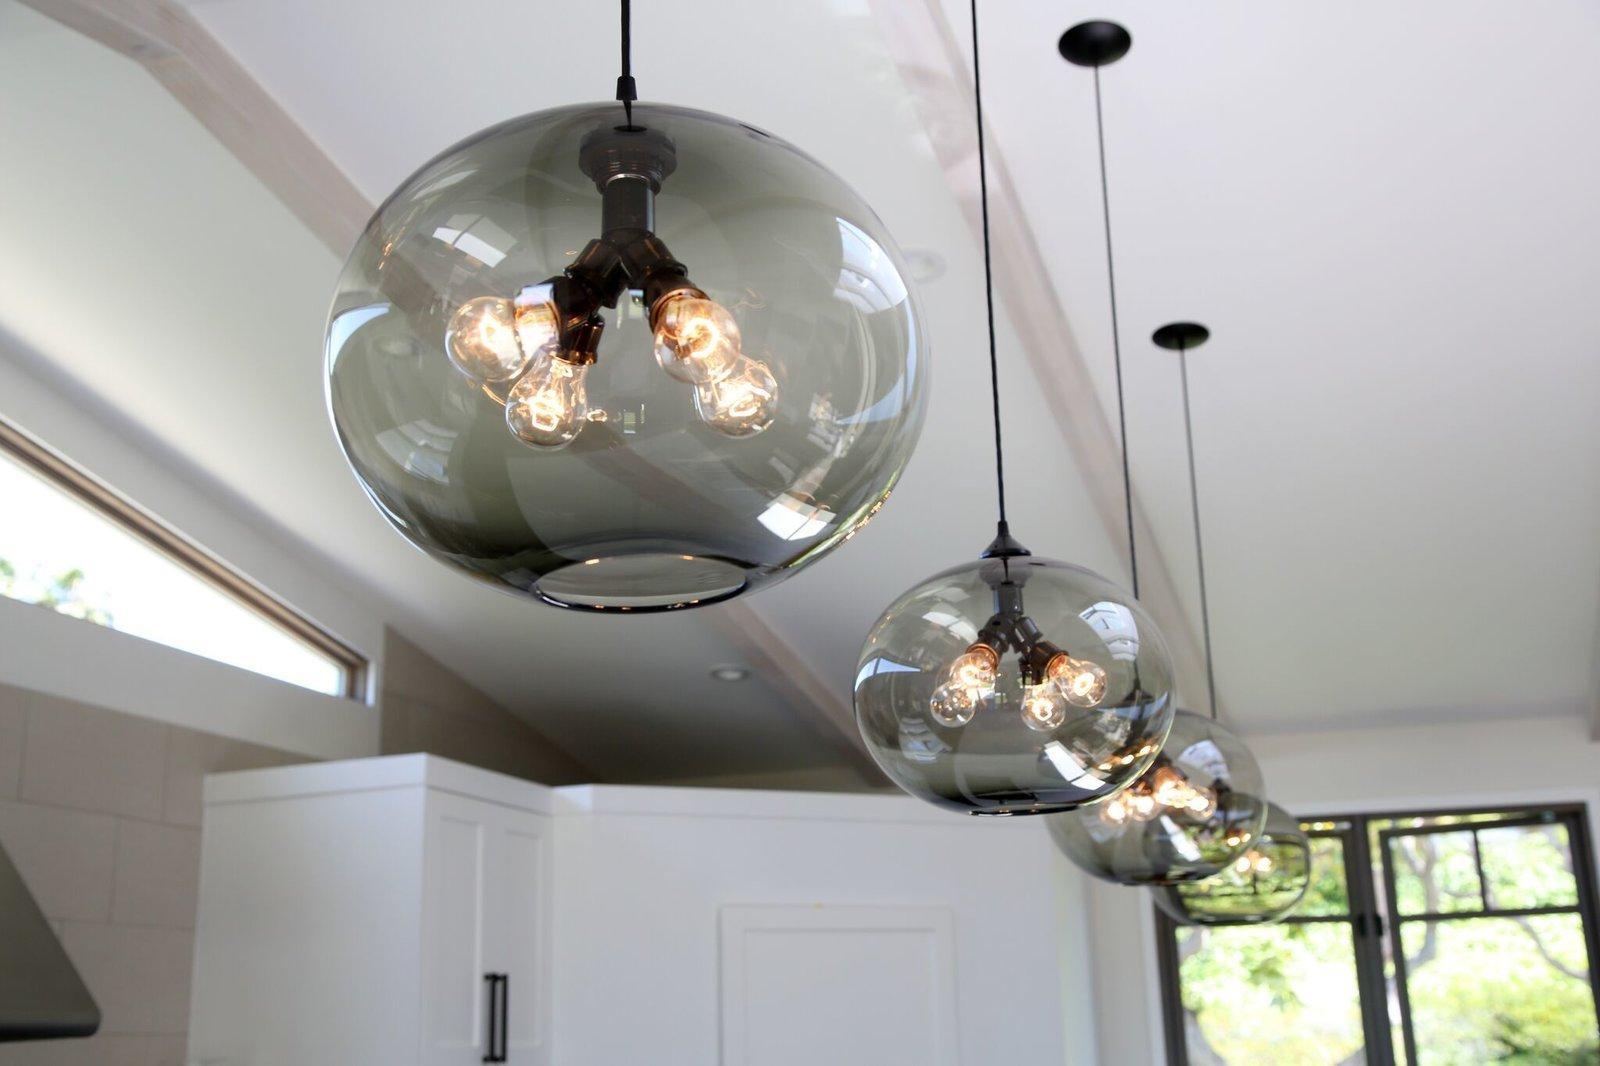 Photo 3 of 5 in Kitchen Island Modern Lighting Adds Minimalist Feel to California Home